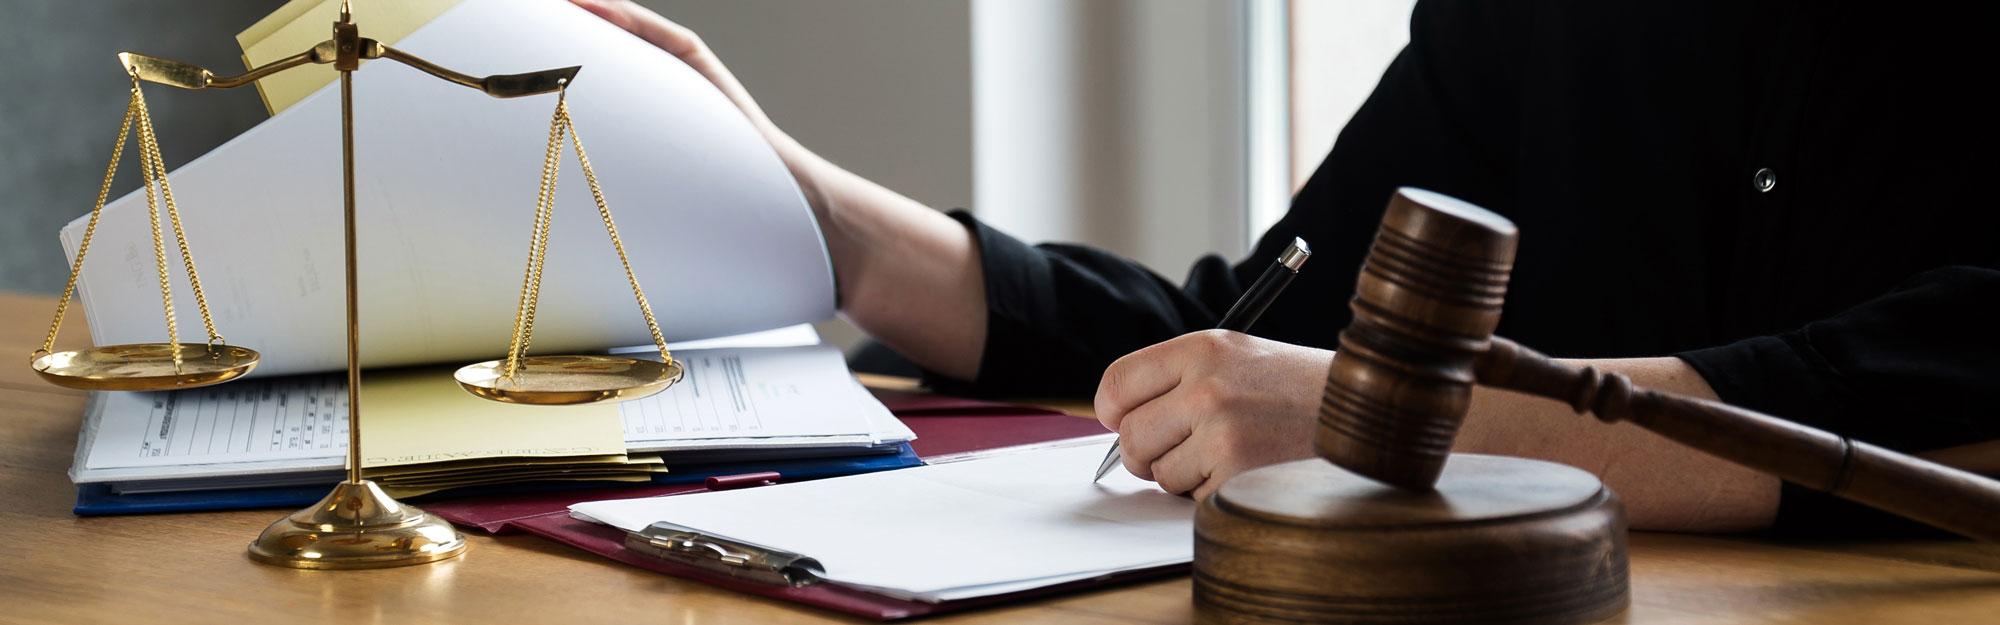 Bachelor of Law - Saint Joseph University - Dubai